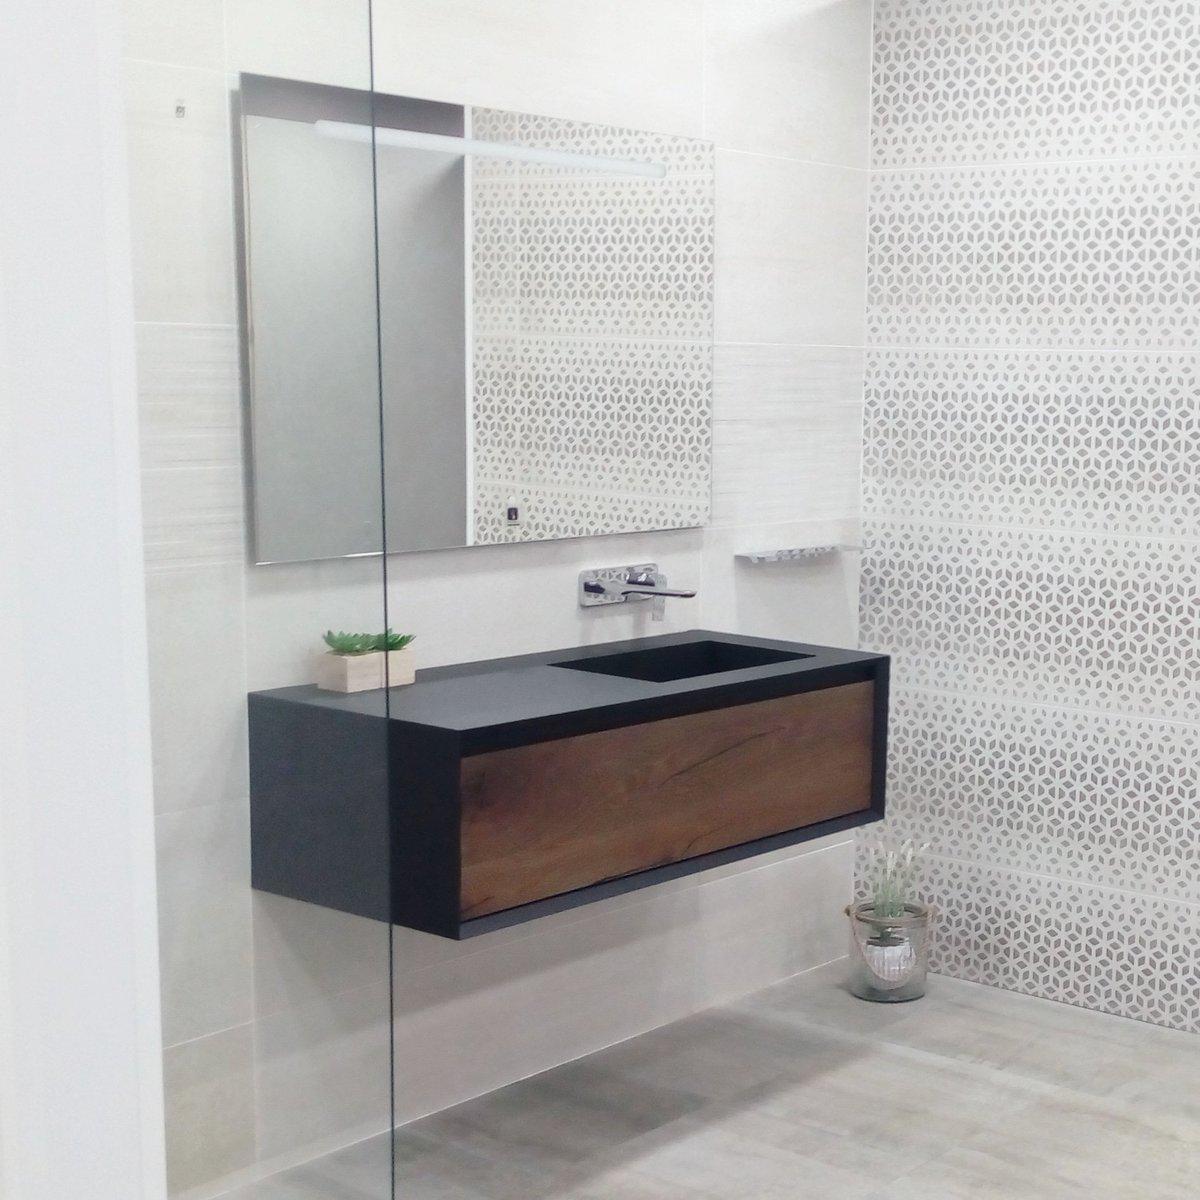 Mobili bagno stocco mobile lavabo sospeso in quercia in - Mobili bagno stocco ...